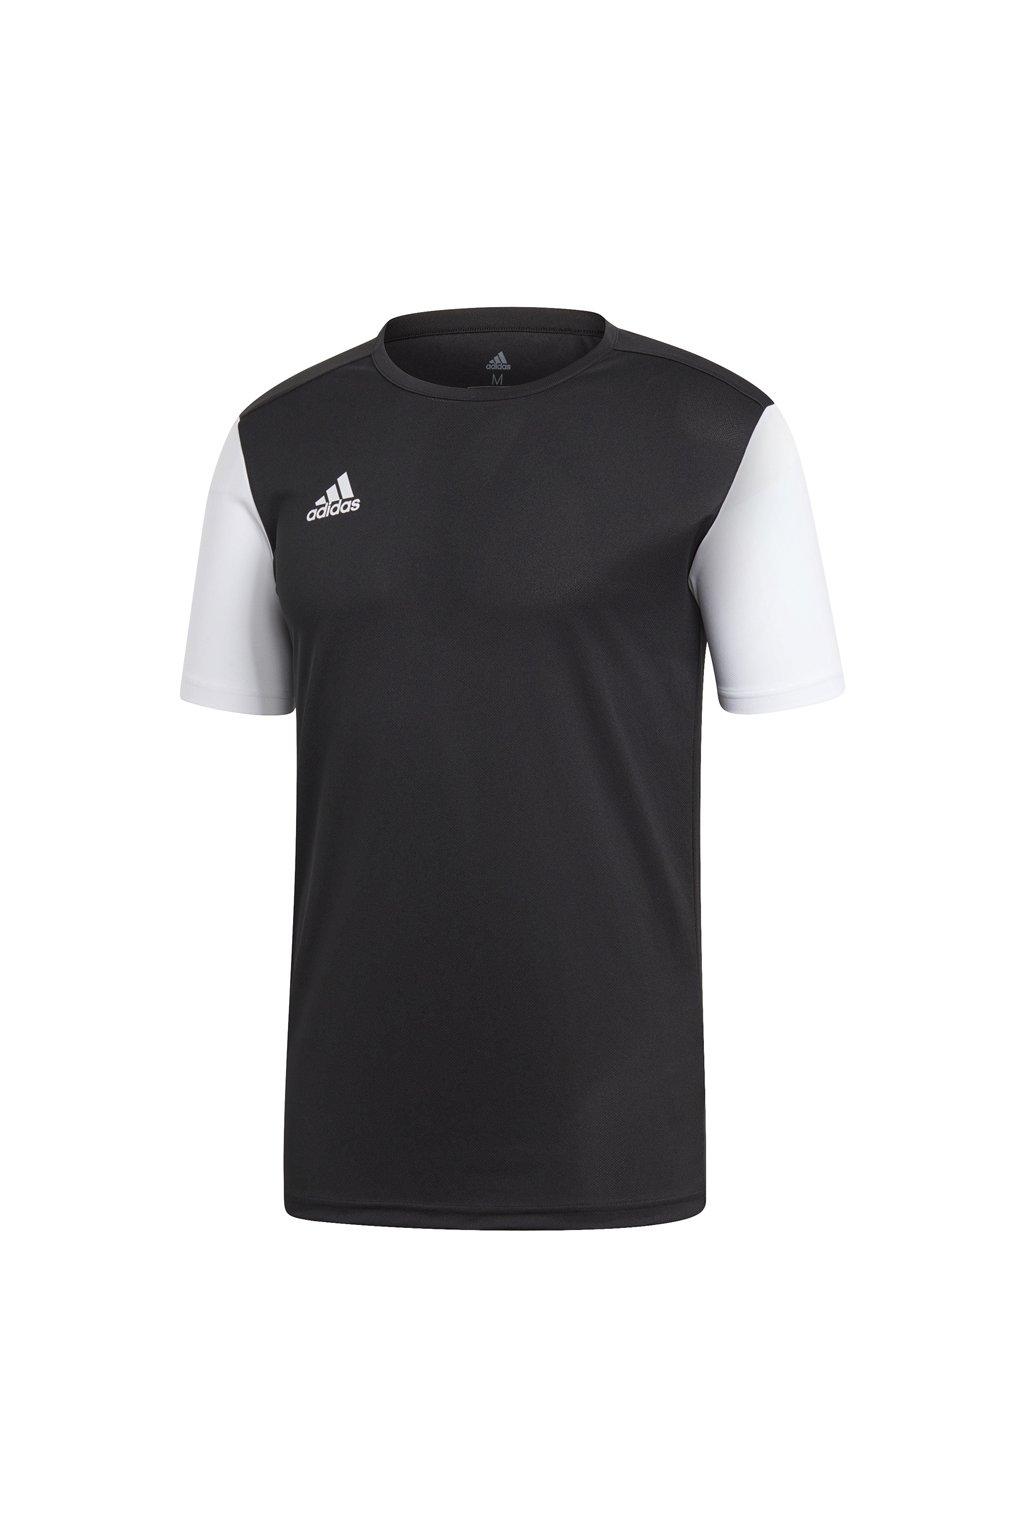 Detské tričko Adidas Estro 19 Jersey JUNIOR čierne DP3233